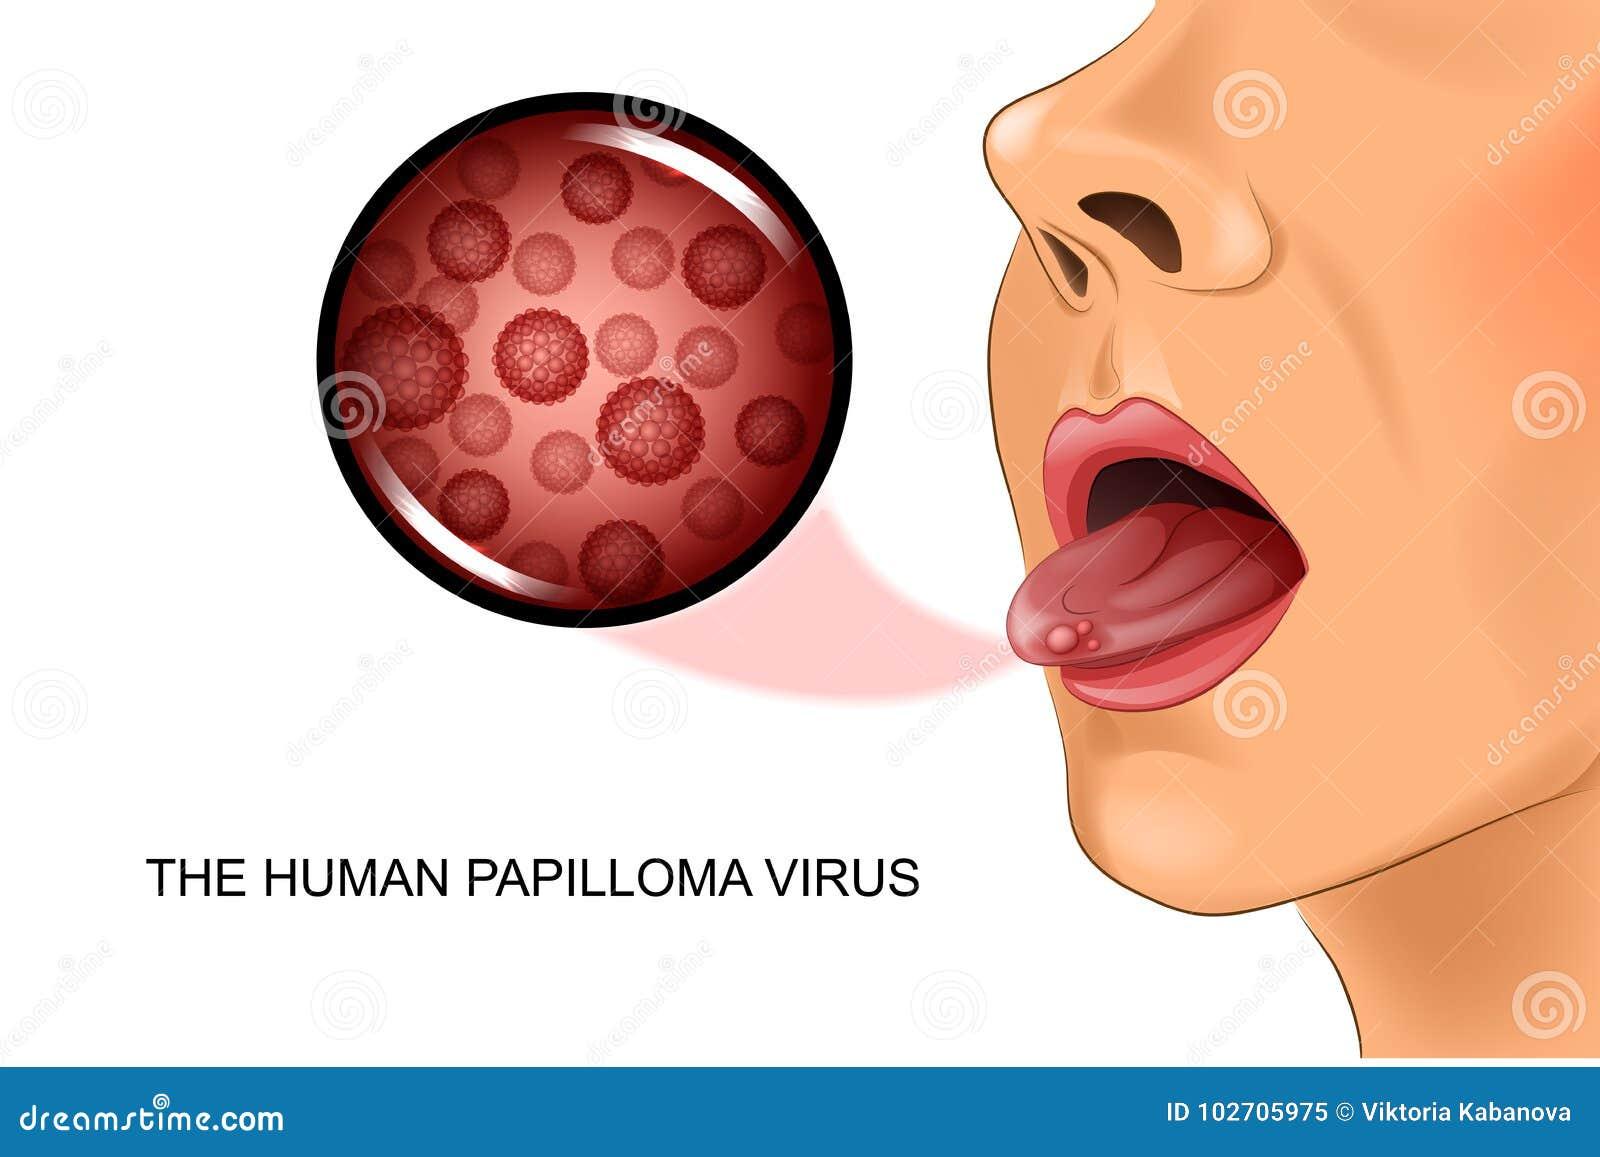 papillomavirus langue symptomes)